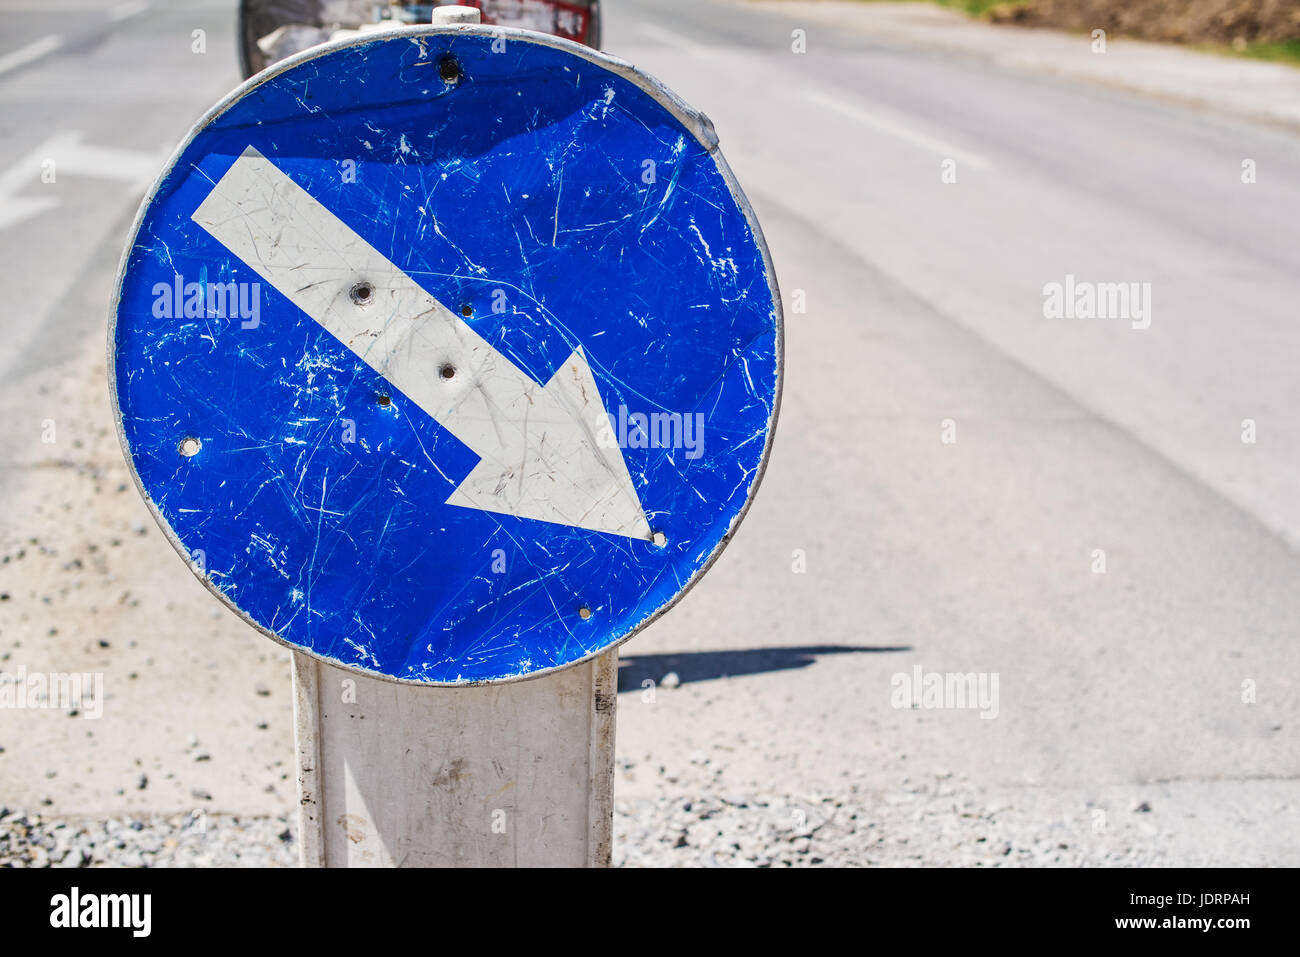 Weathered mandatory traffic direction sign on the street - Stock Image